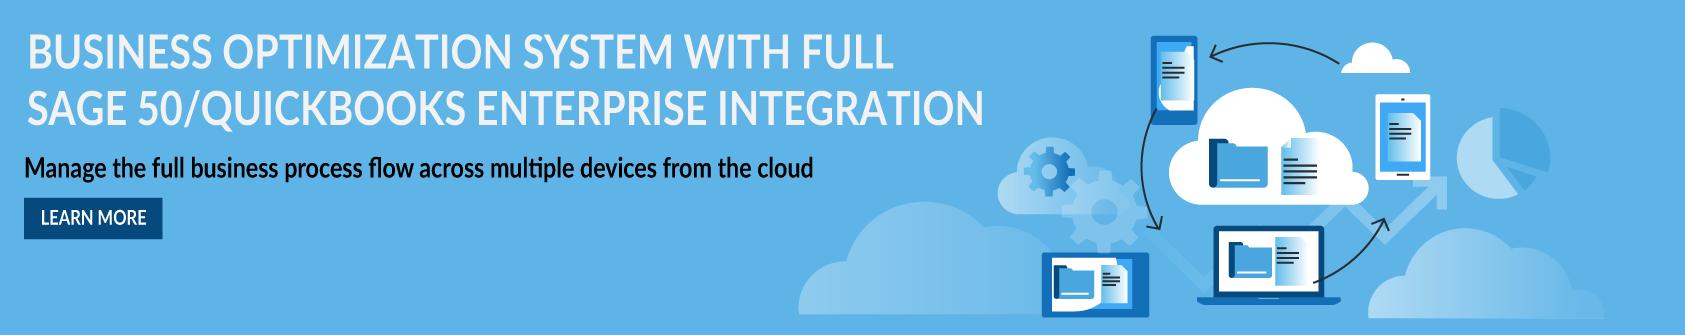 Business Optimization System With Full Sage 50/QuickBooks Enterprise Integration